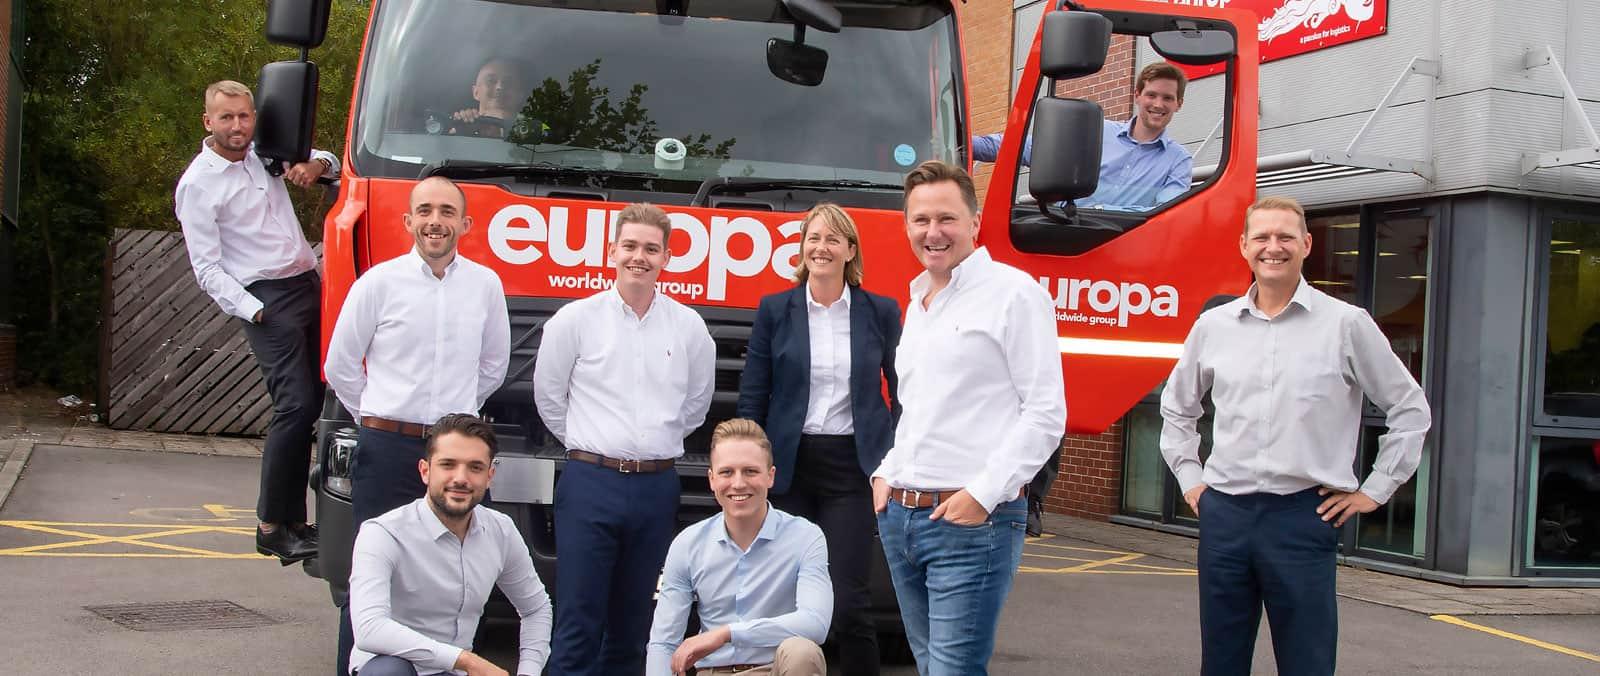 Europa Sheffield Branch